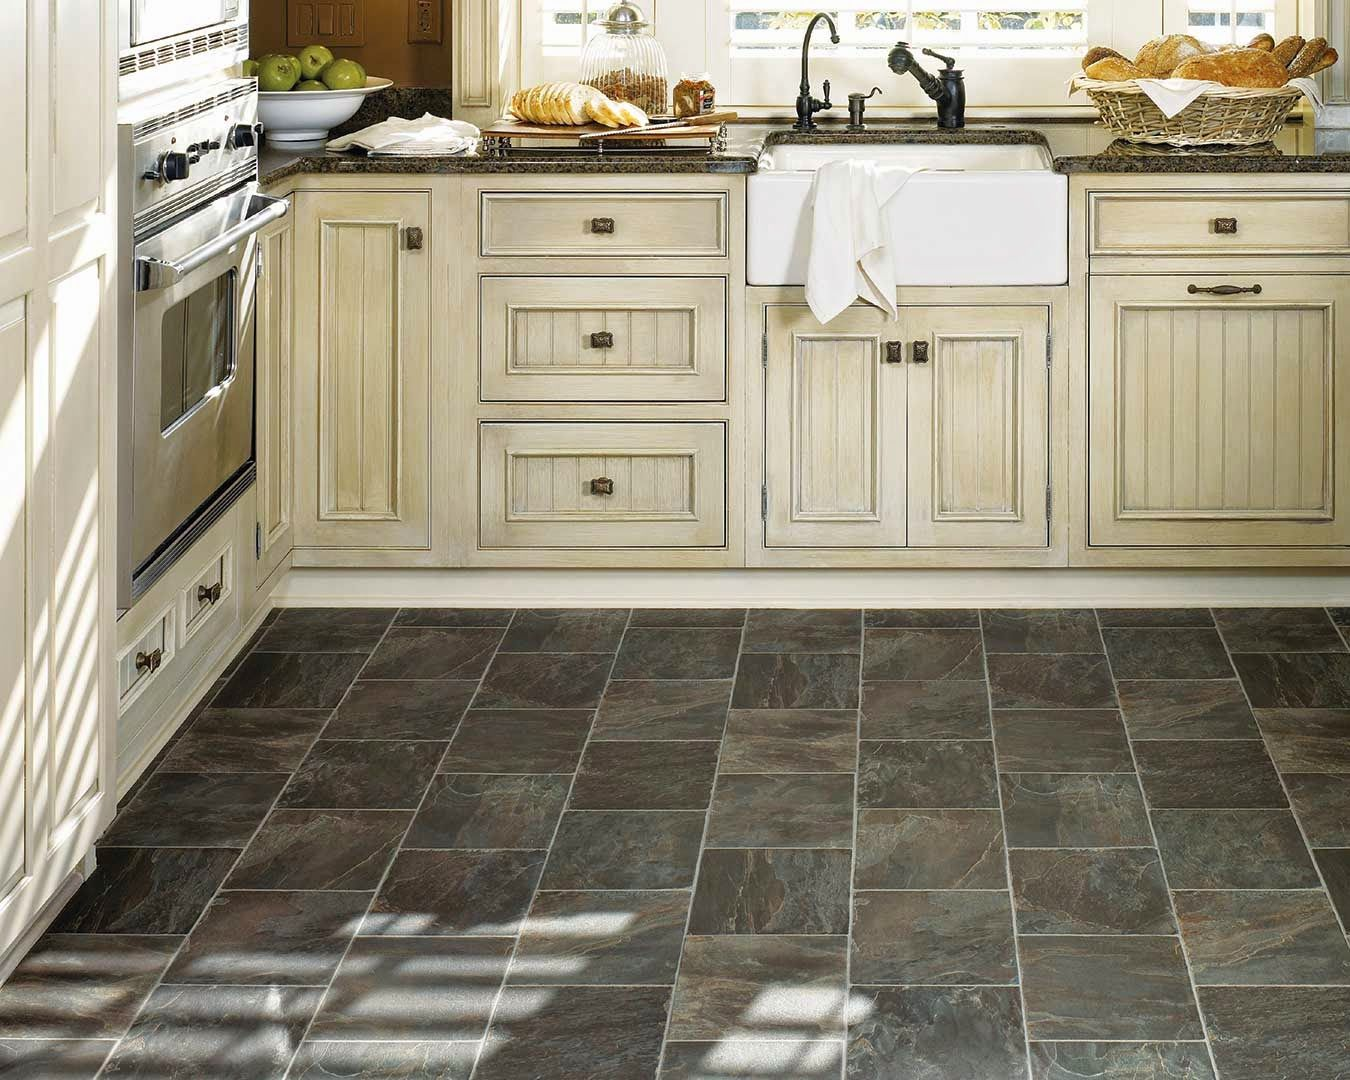 kitchen floor lino pickled oak cabinets dark floors Best Black Vinyl Sheet Flooring For Small Kitchen With Old